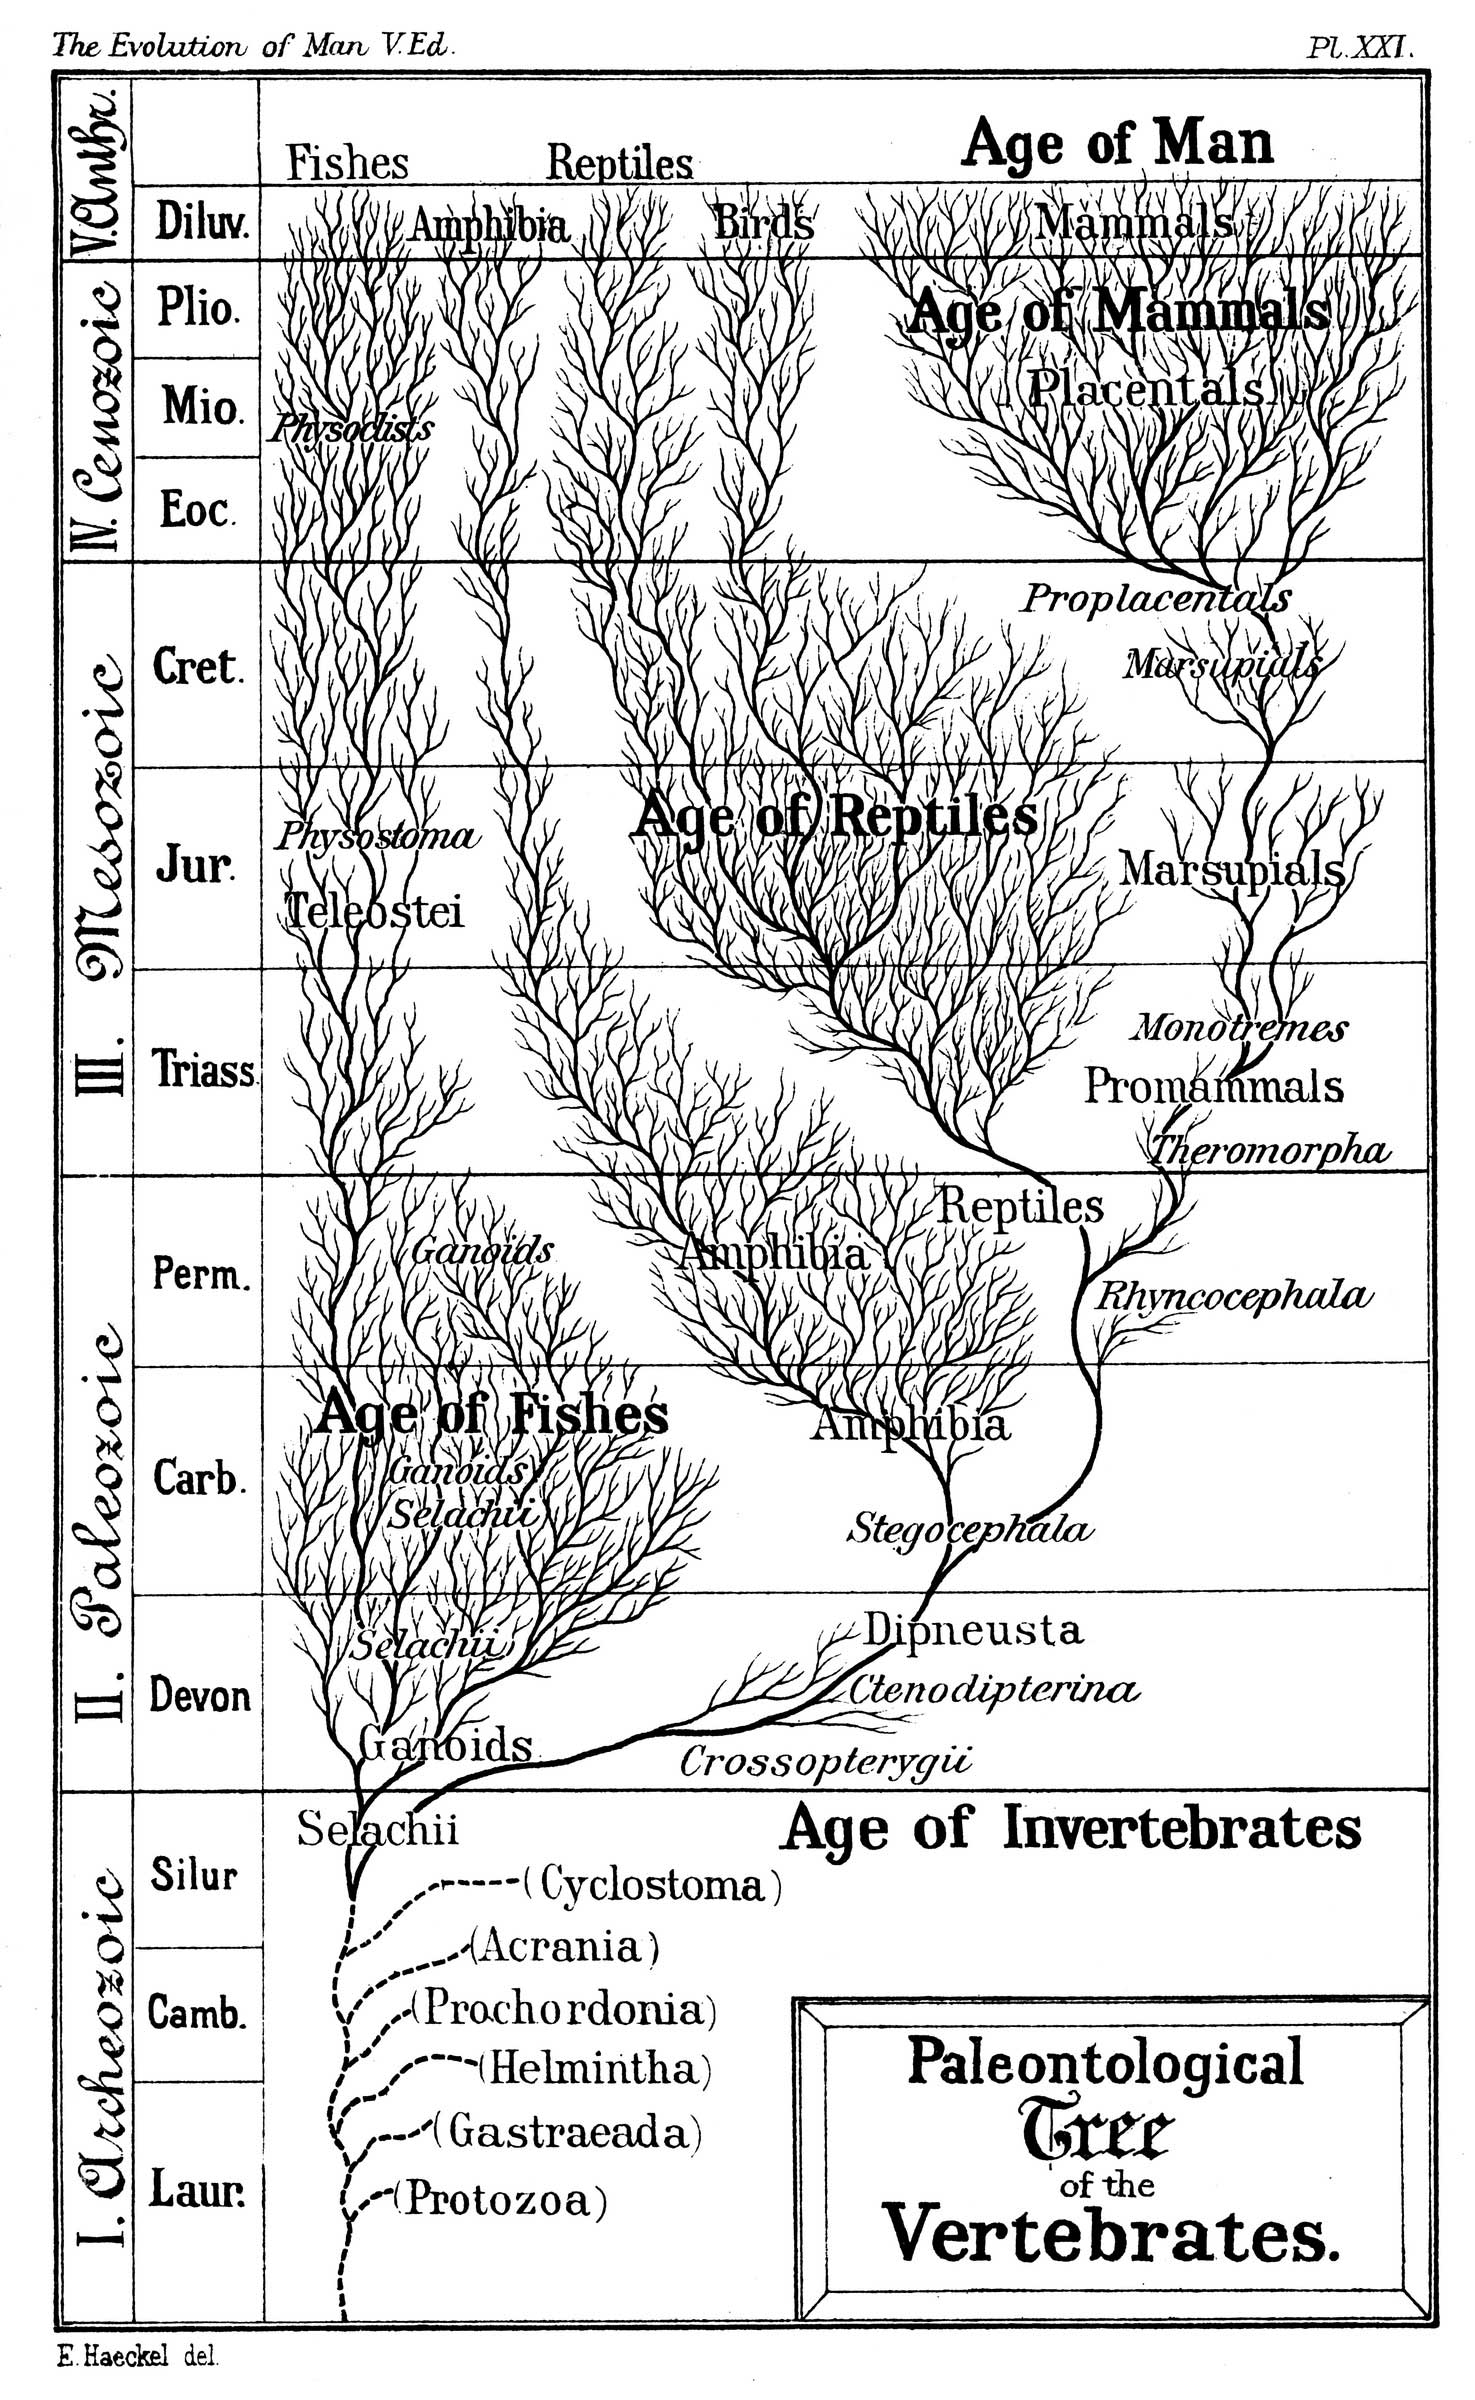 morphology tree diagram haltech e6k wiring rx7 timeline of human evolution wikipedia